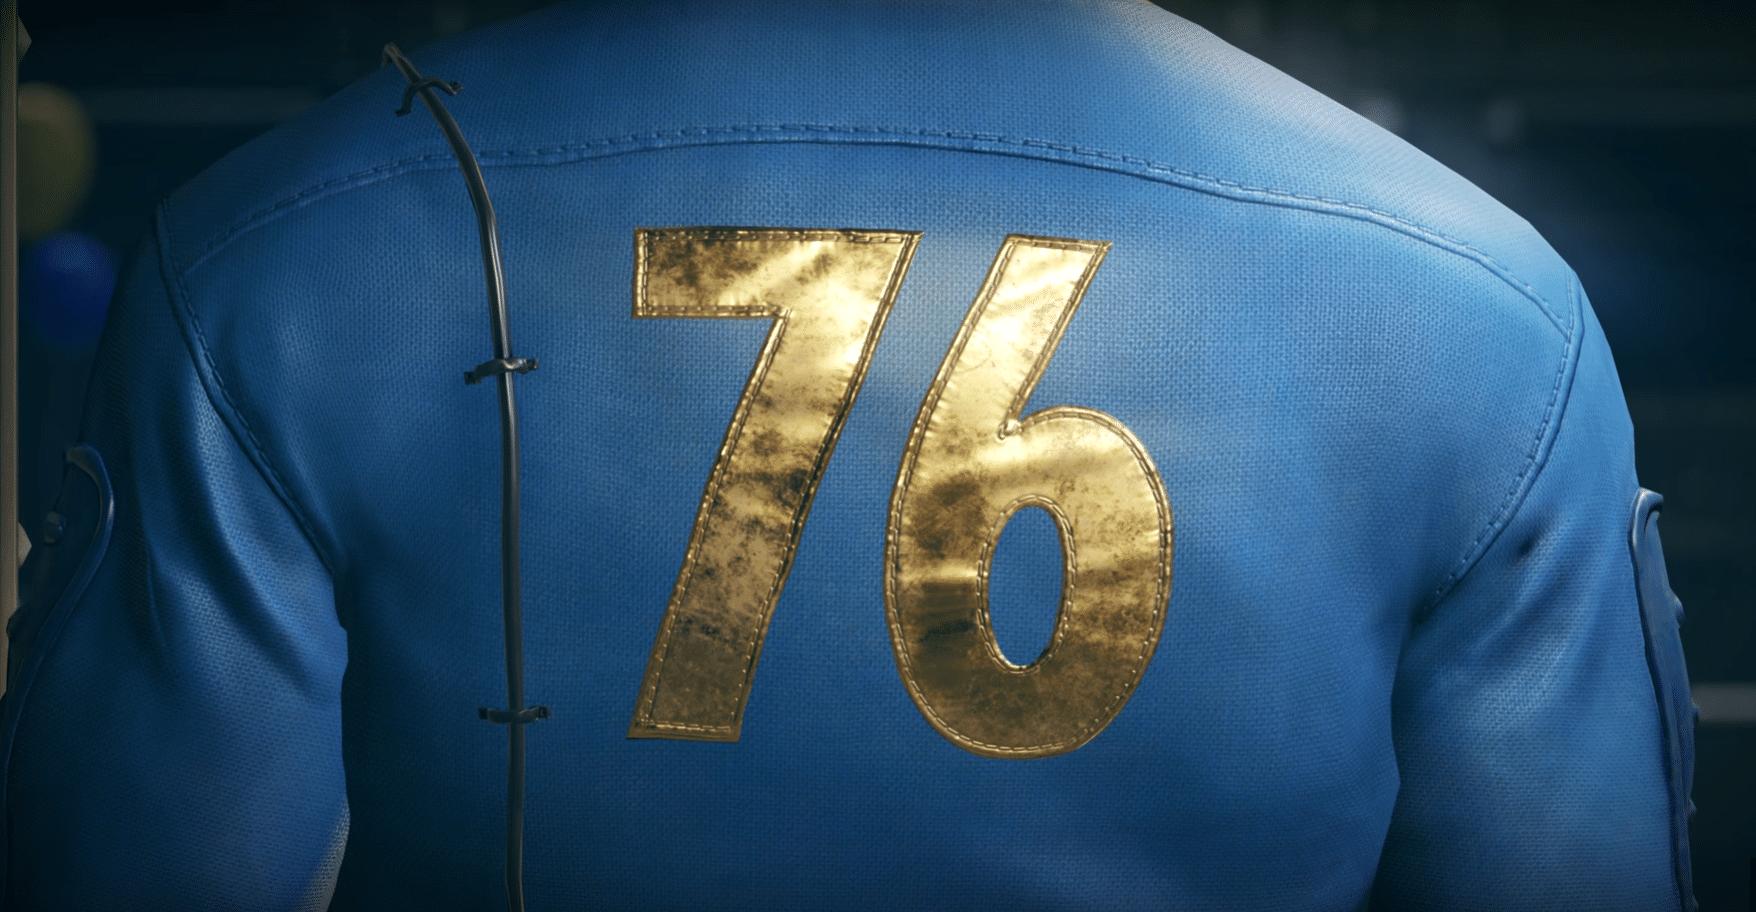 Gestern hat Bethesda Fallout 76 angekündigt.